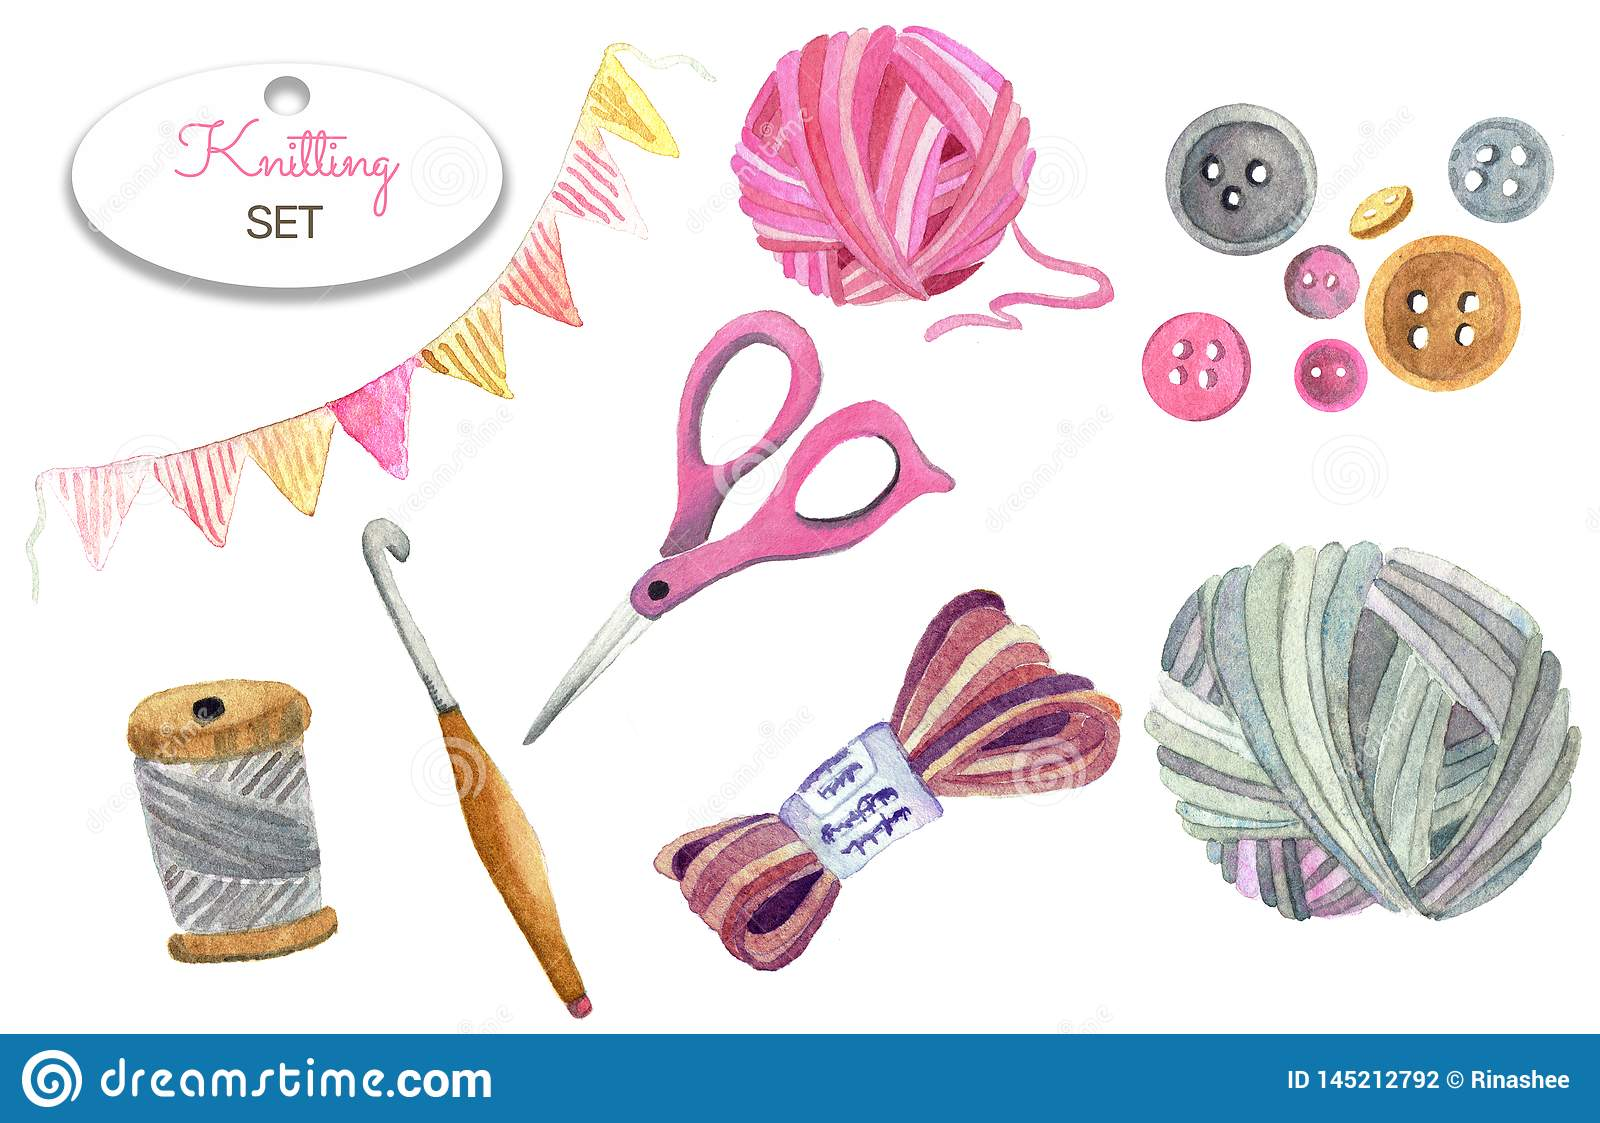 Scissors, yarn, buttons, balls of yarn.